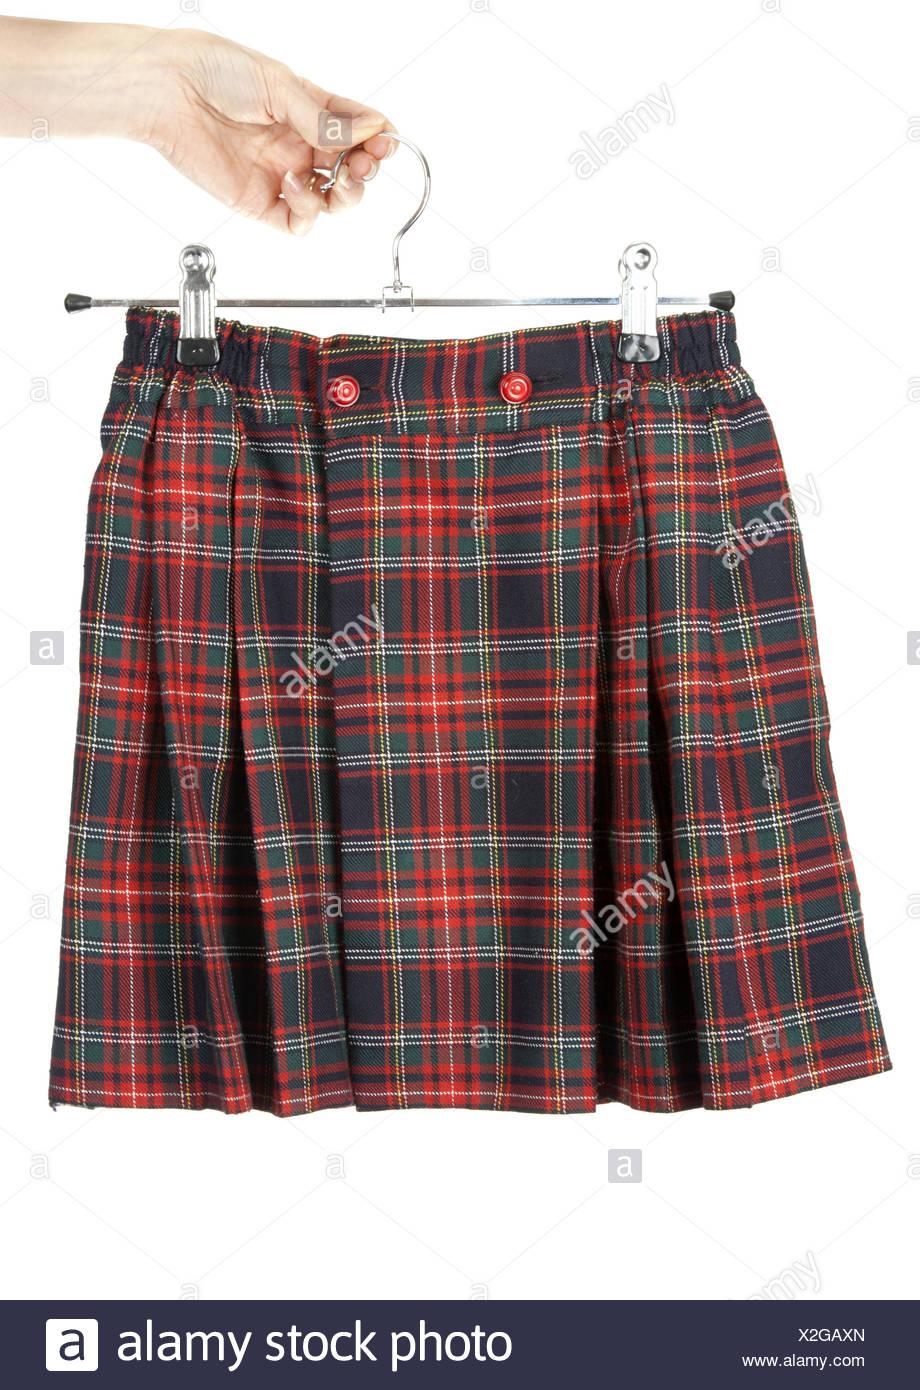 8e56b30b9205e9 Metallic Skirt Stock Photos & Metallic Skirt Stock Images - Alamy